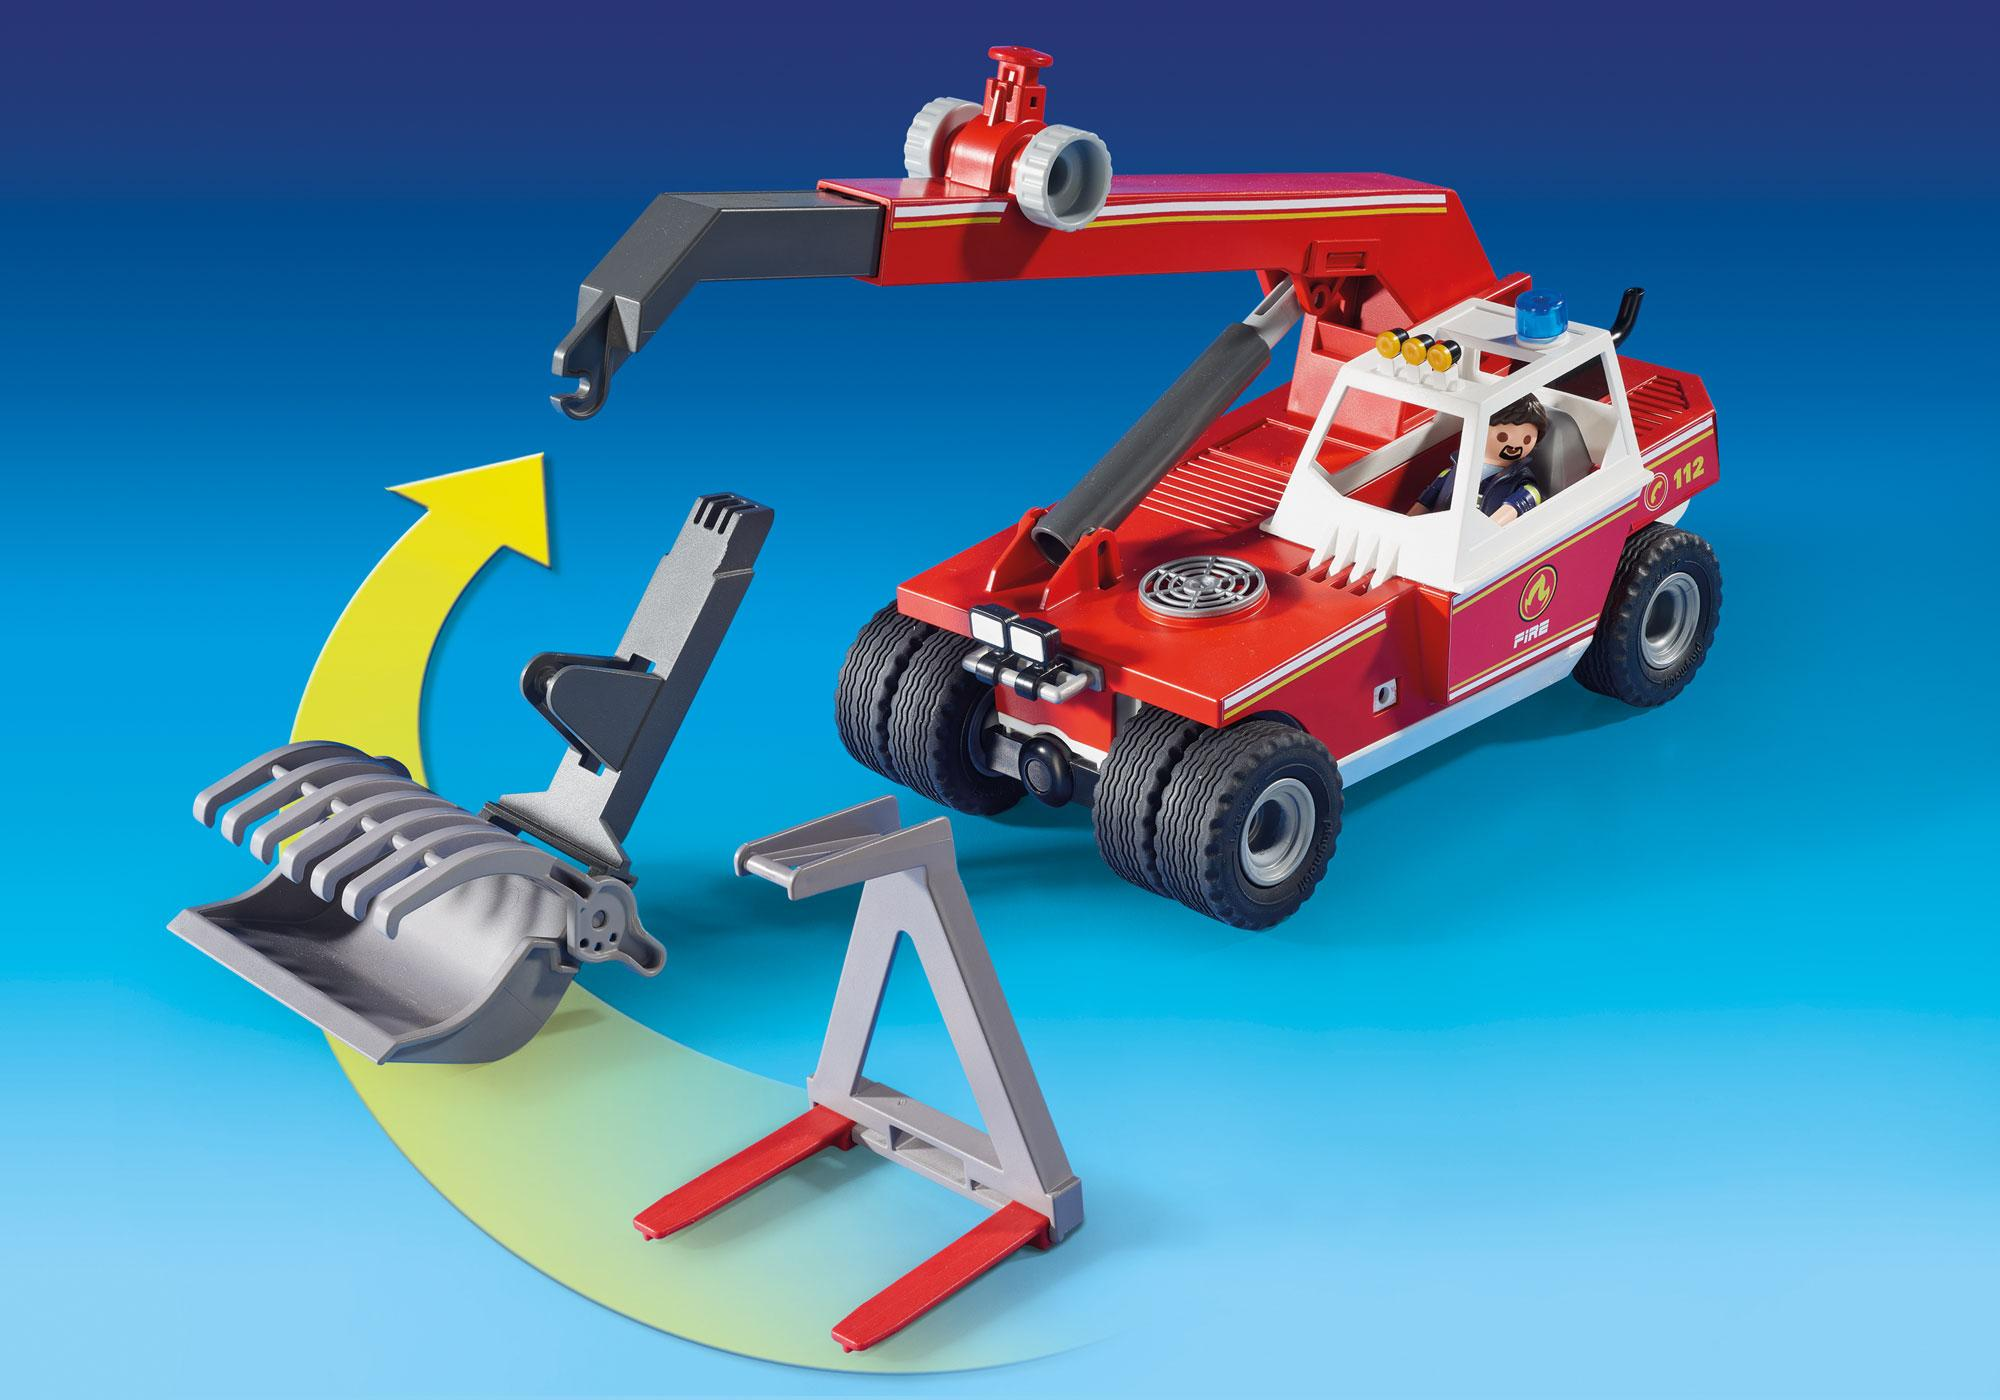 http://media.playmobil.com/i/playmobil/9465_product_extra1/Veicolo con braccio telescopico